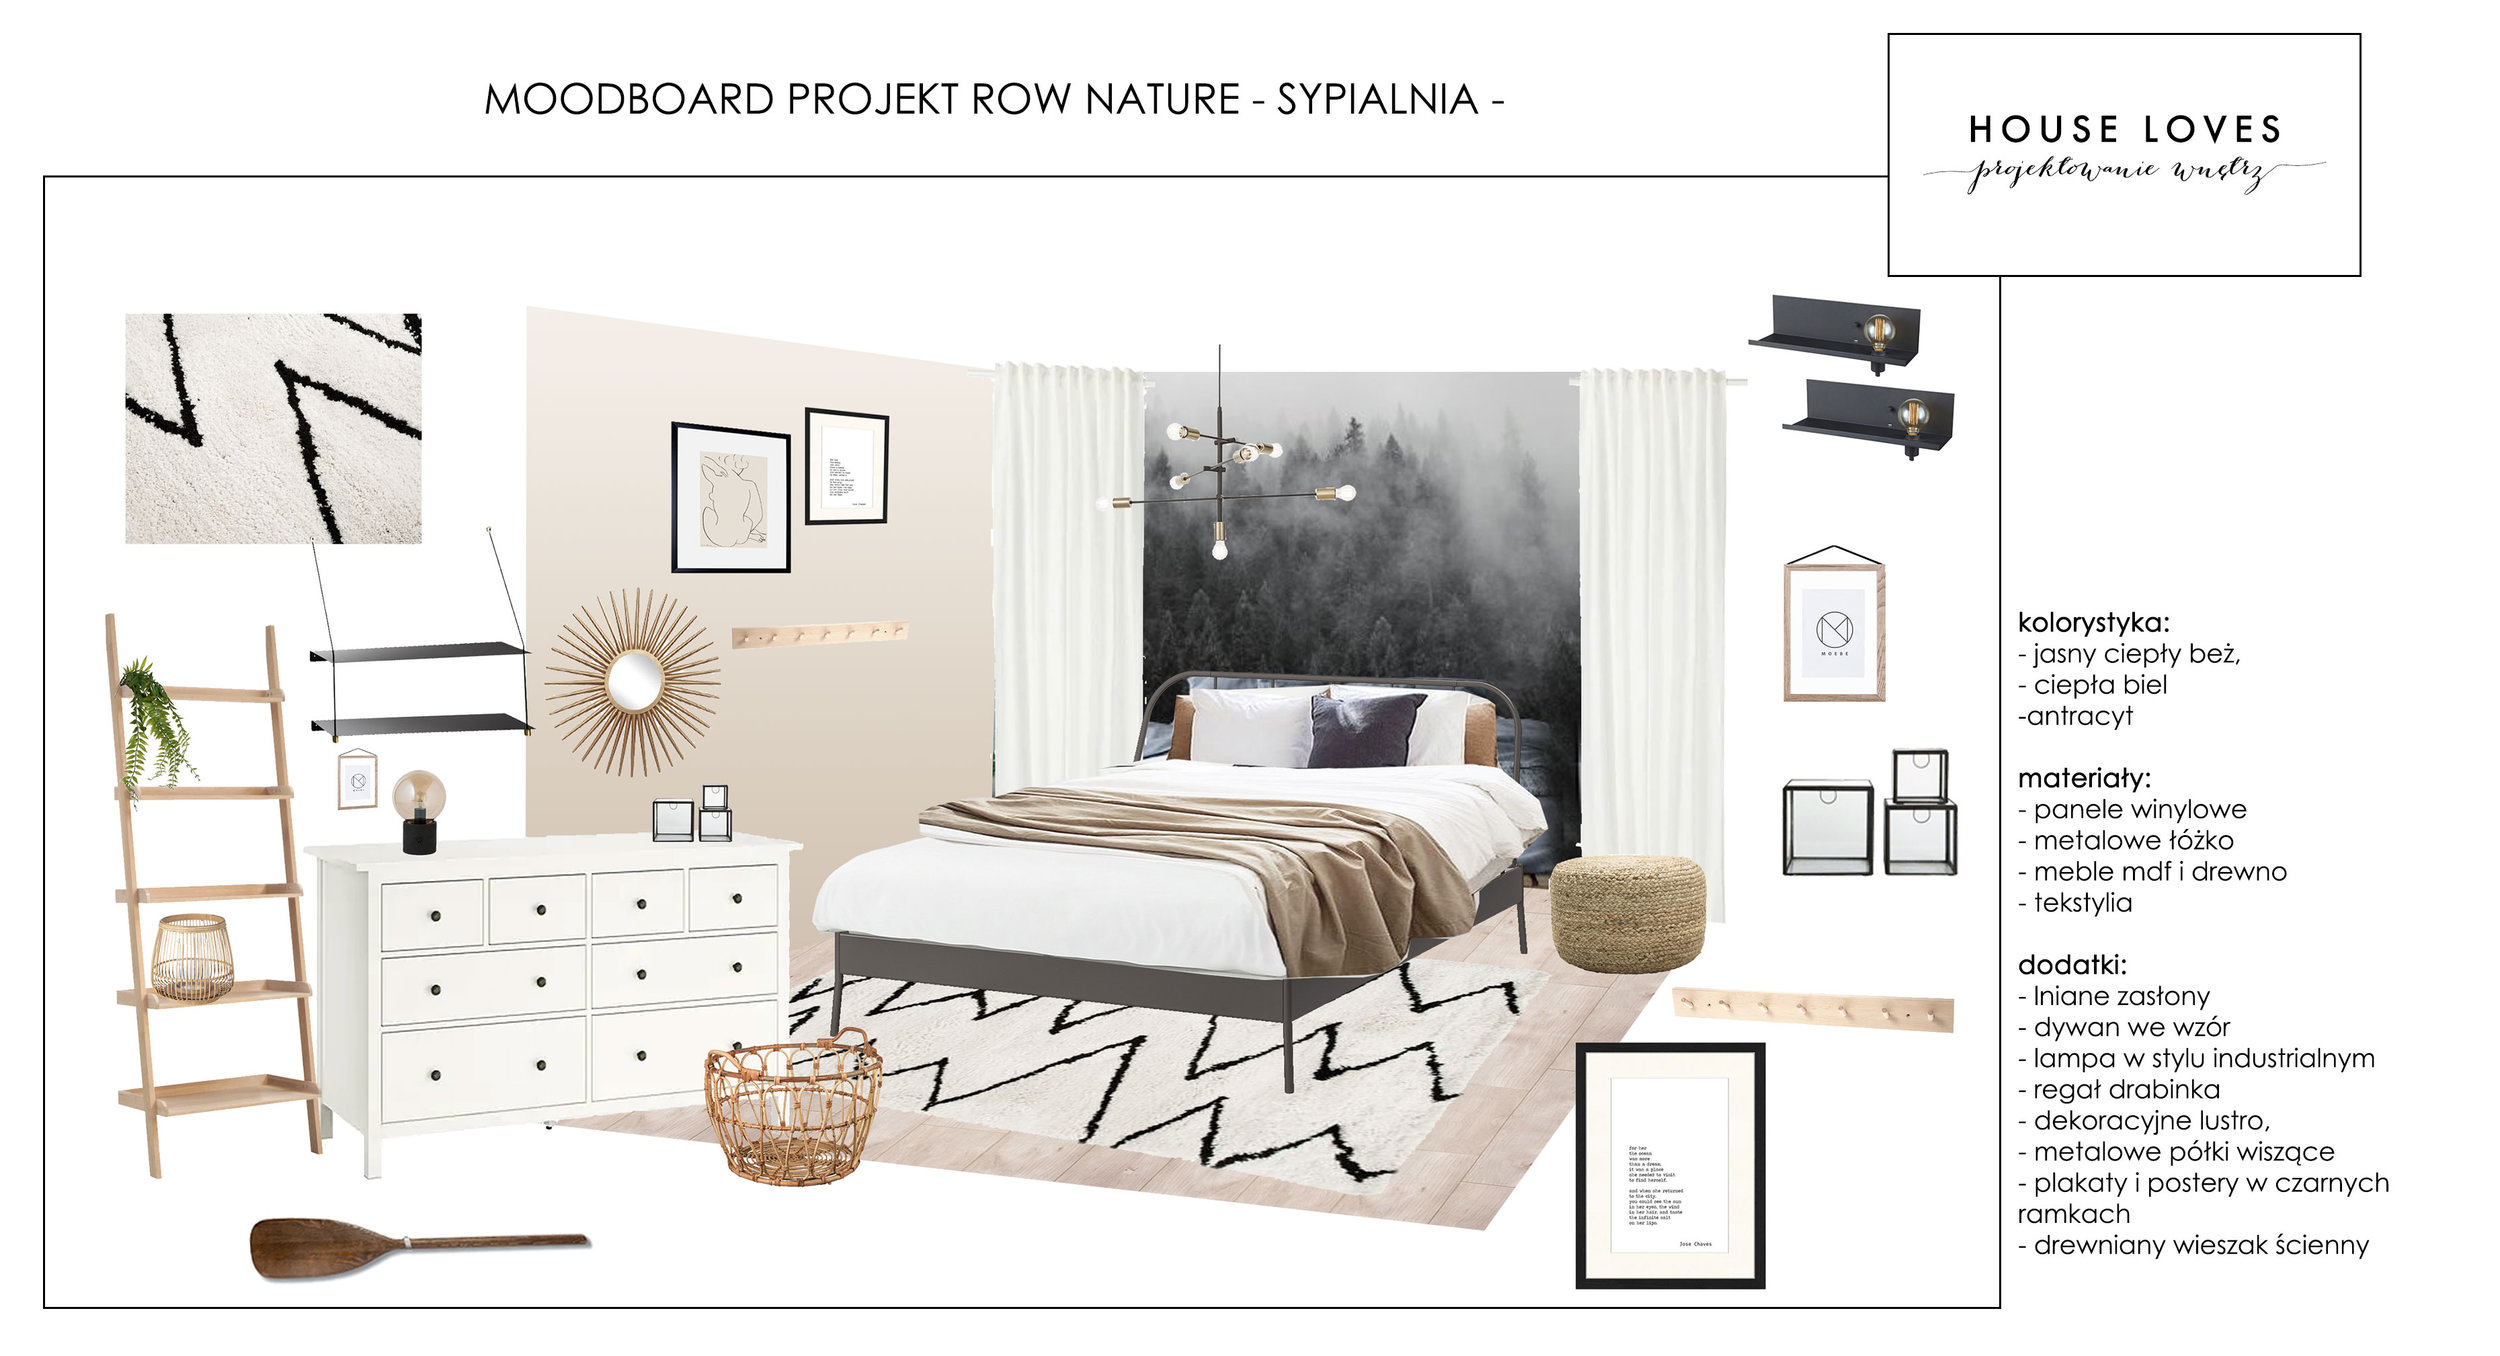 sypialnia-moodboard-row-nature.jpg